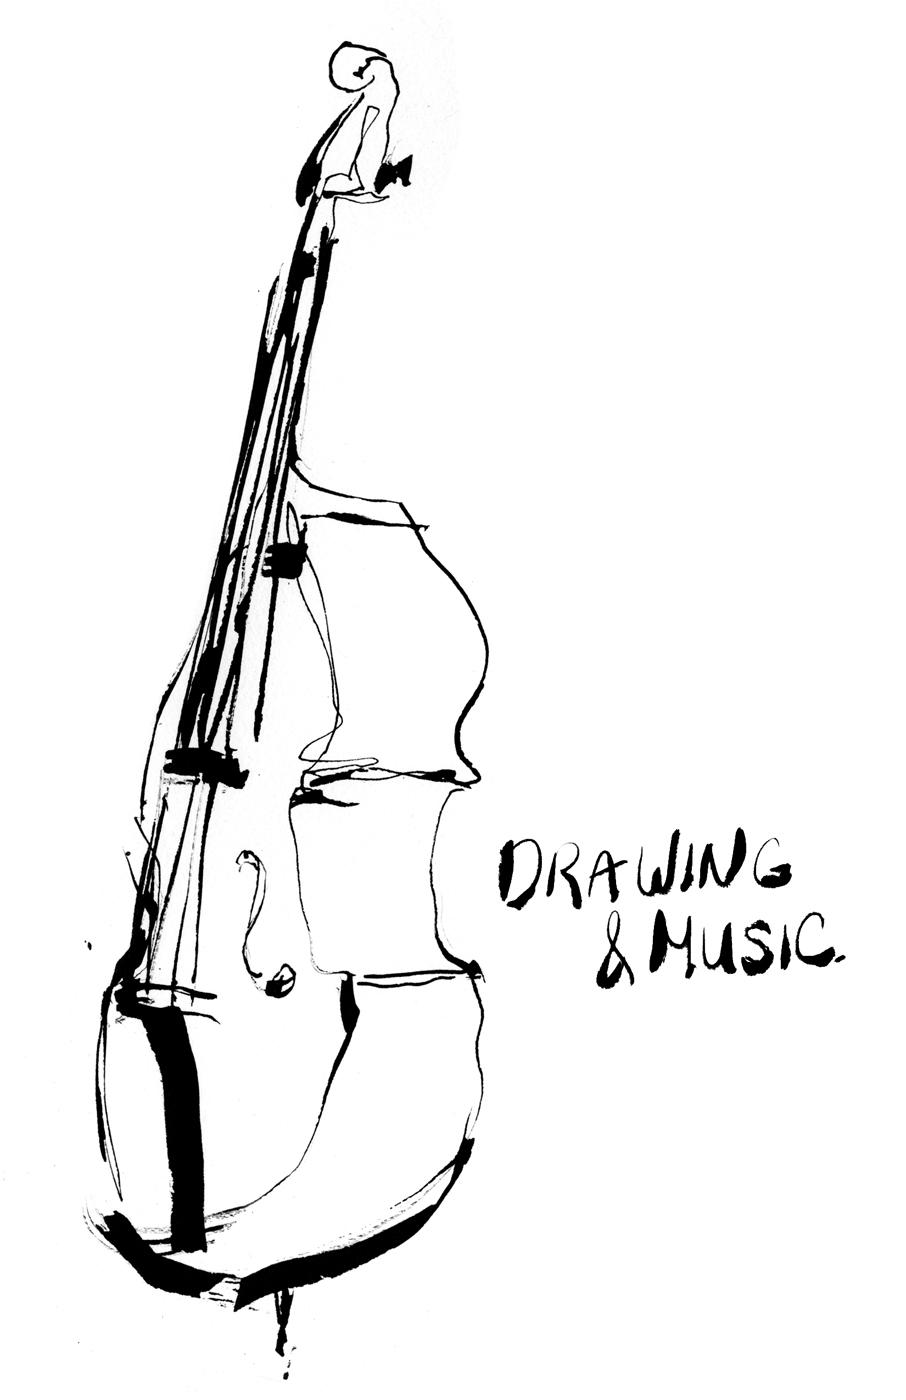 Drawing & Music